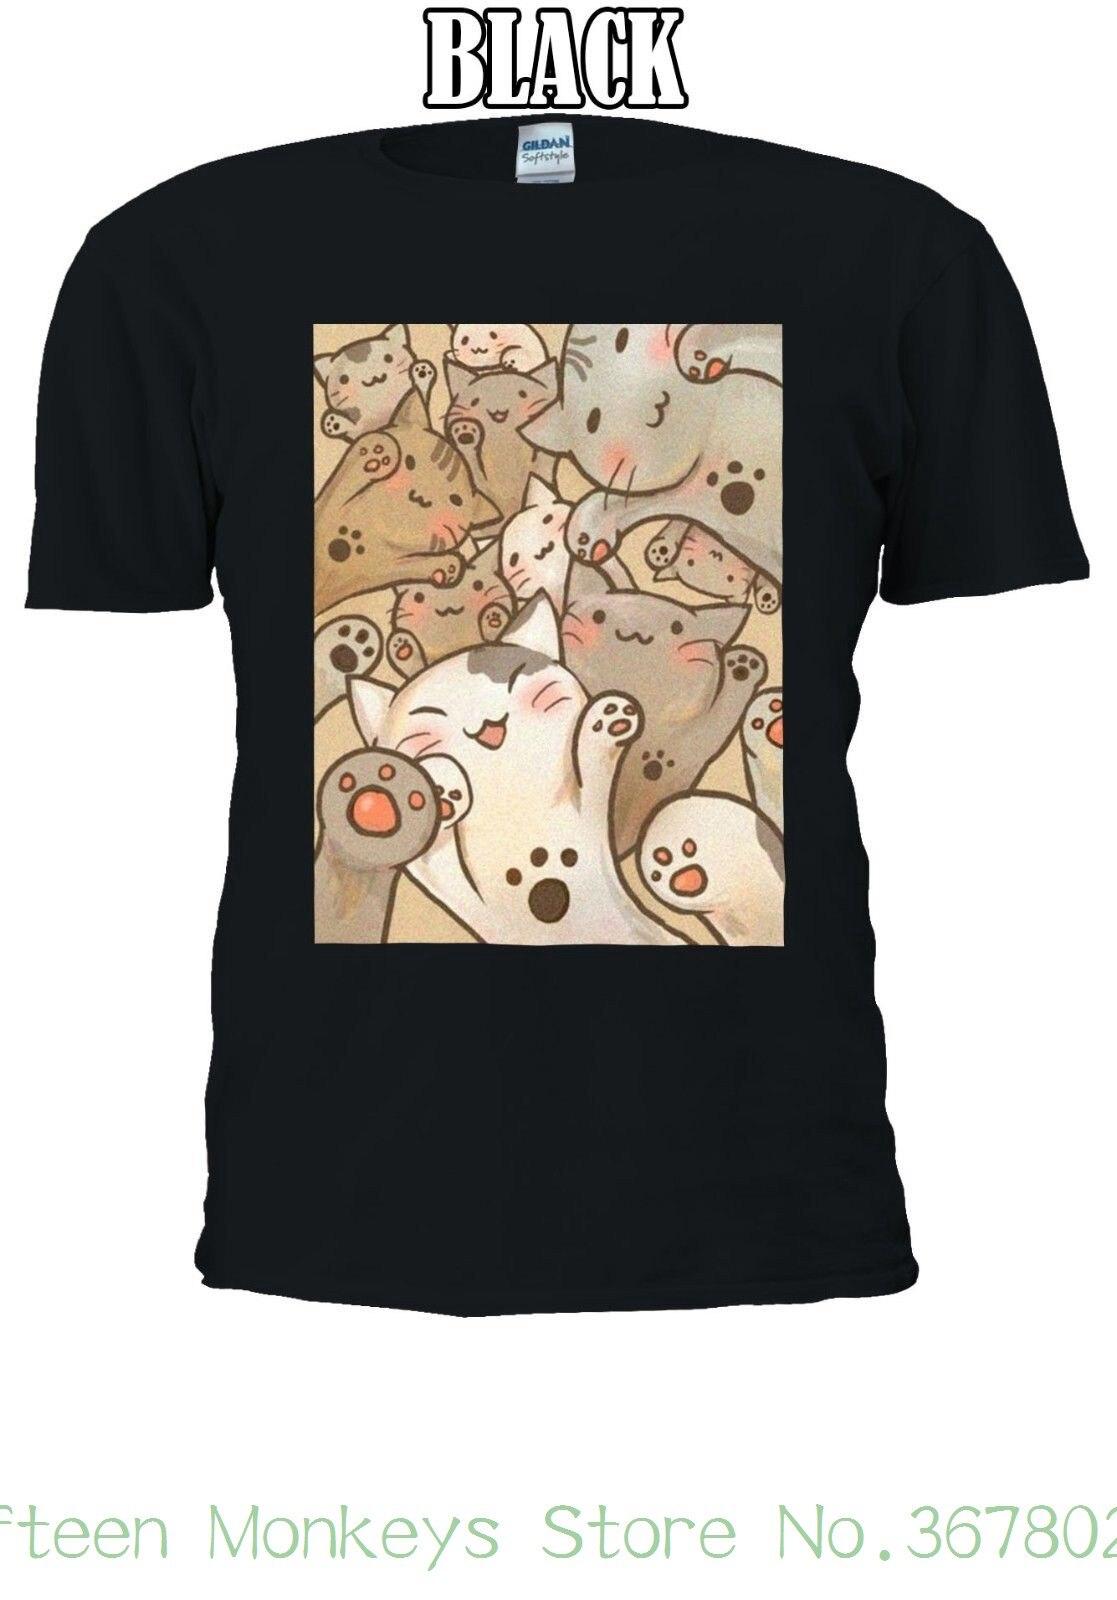 Womens Tee Cutie Cats Japanese Manga Anime T-shirt Men Women Unisex 2438 Shirt Sexy Sexy At Any Cost Home